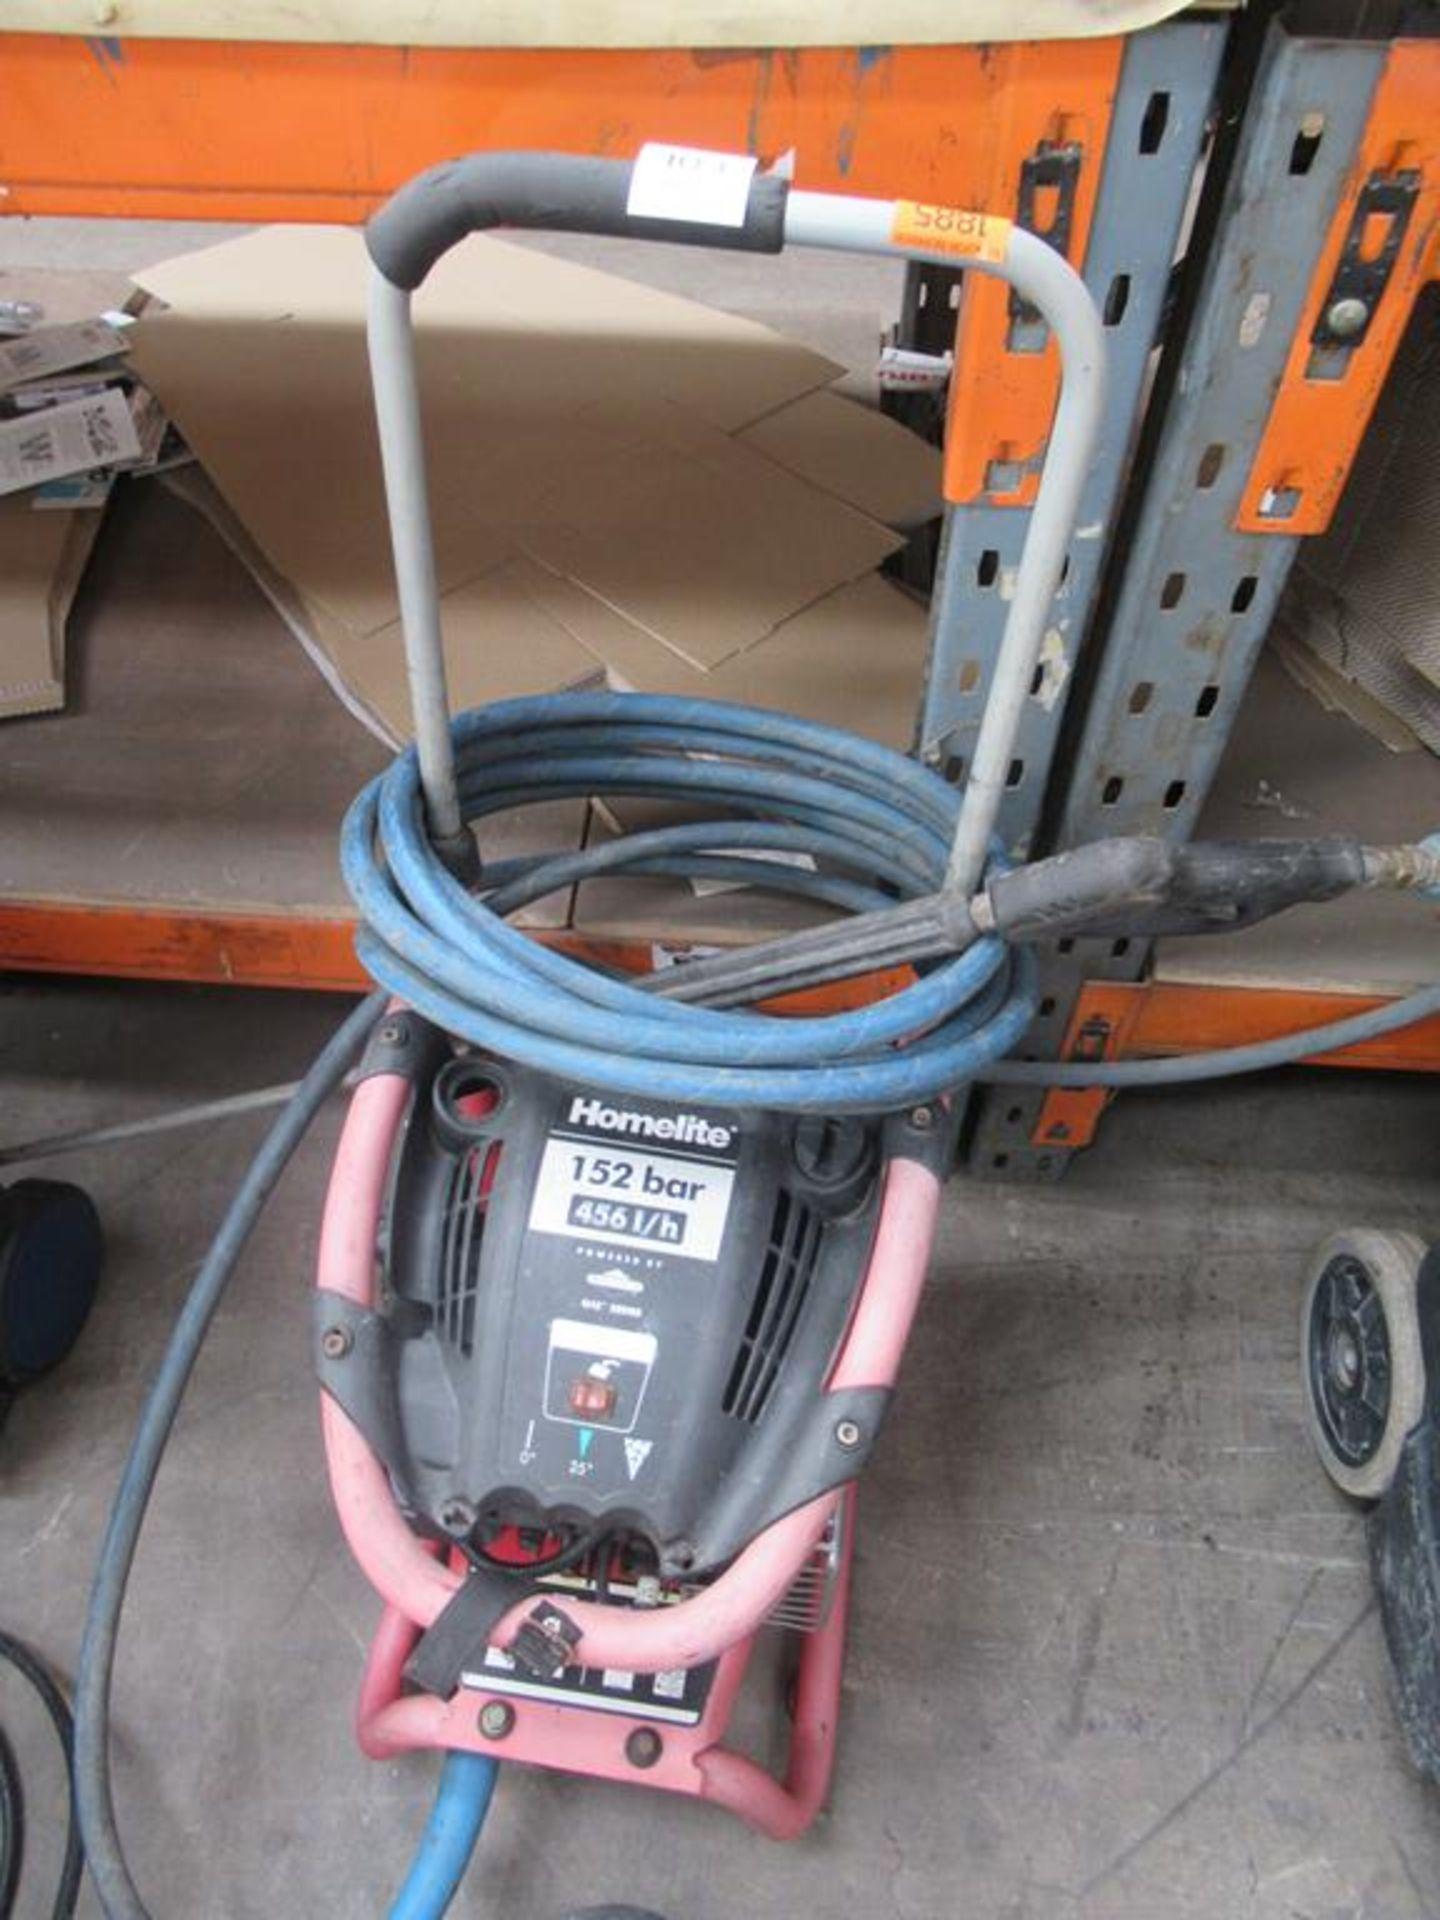 Homelite Q45 series petrol powered pressure washer